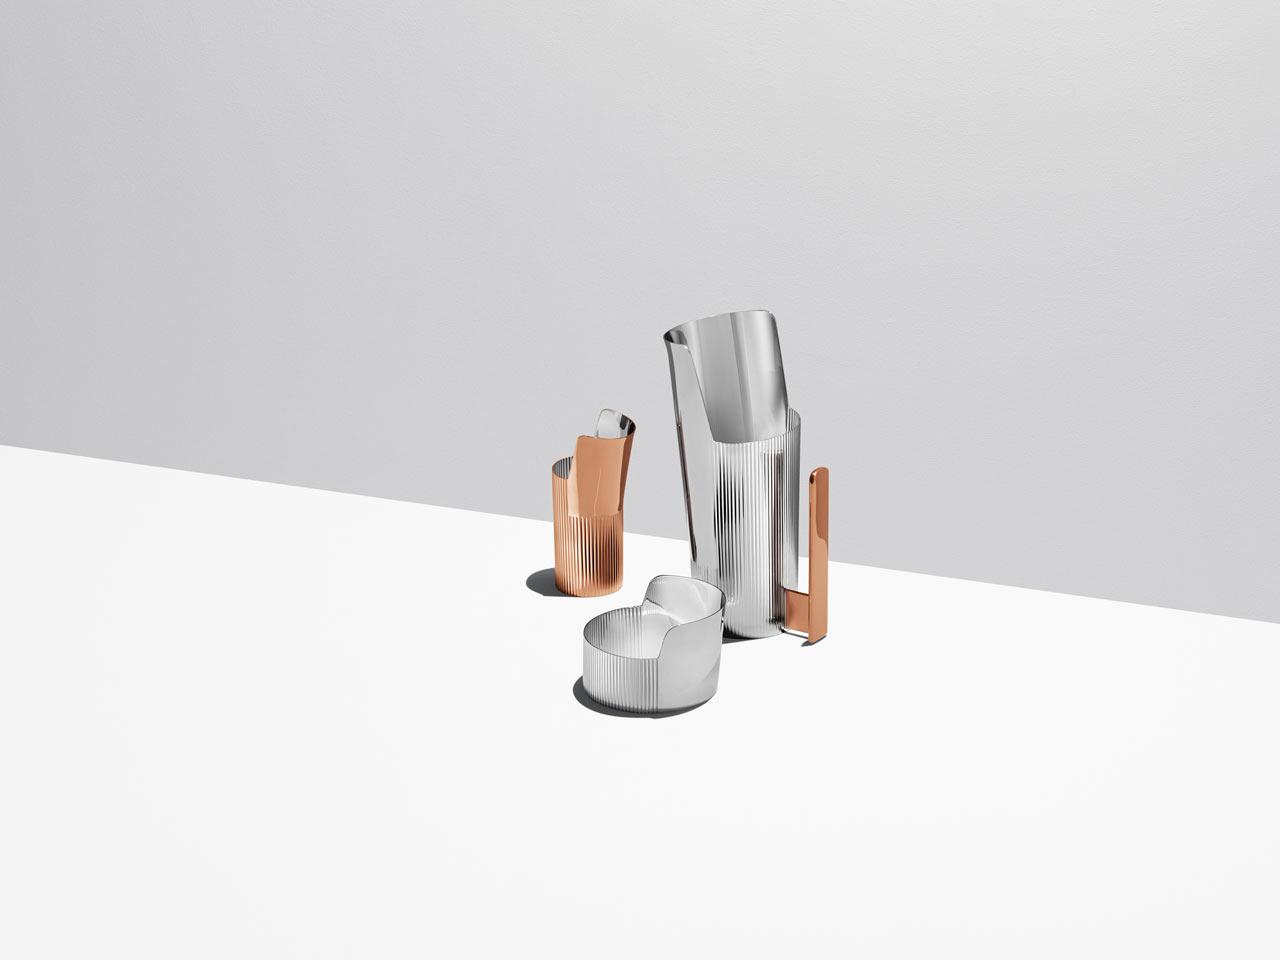 Patricia Urquiola's Tableware Collection for Georg Jensen